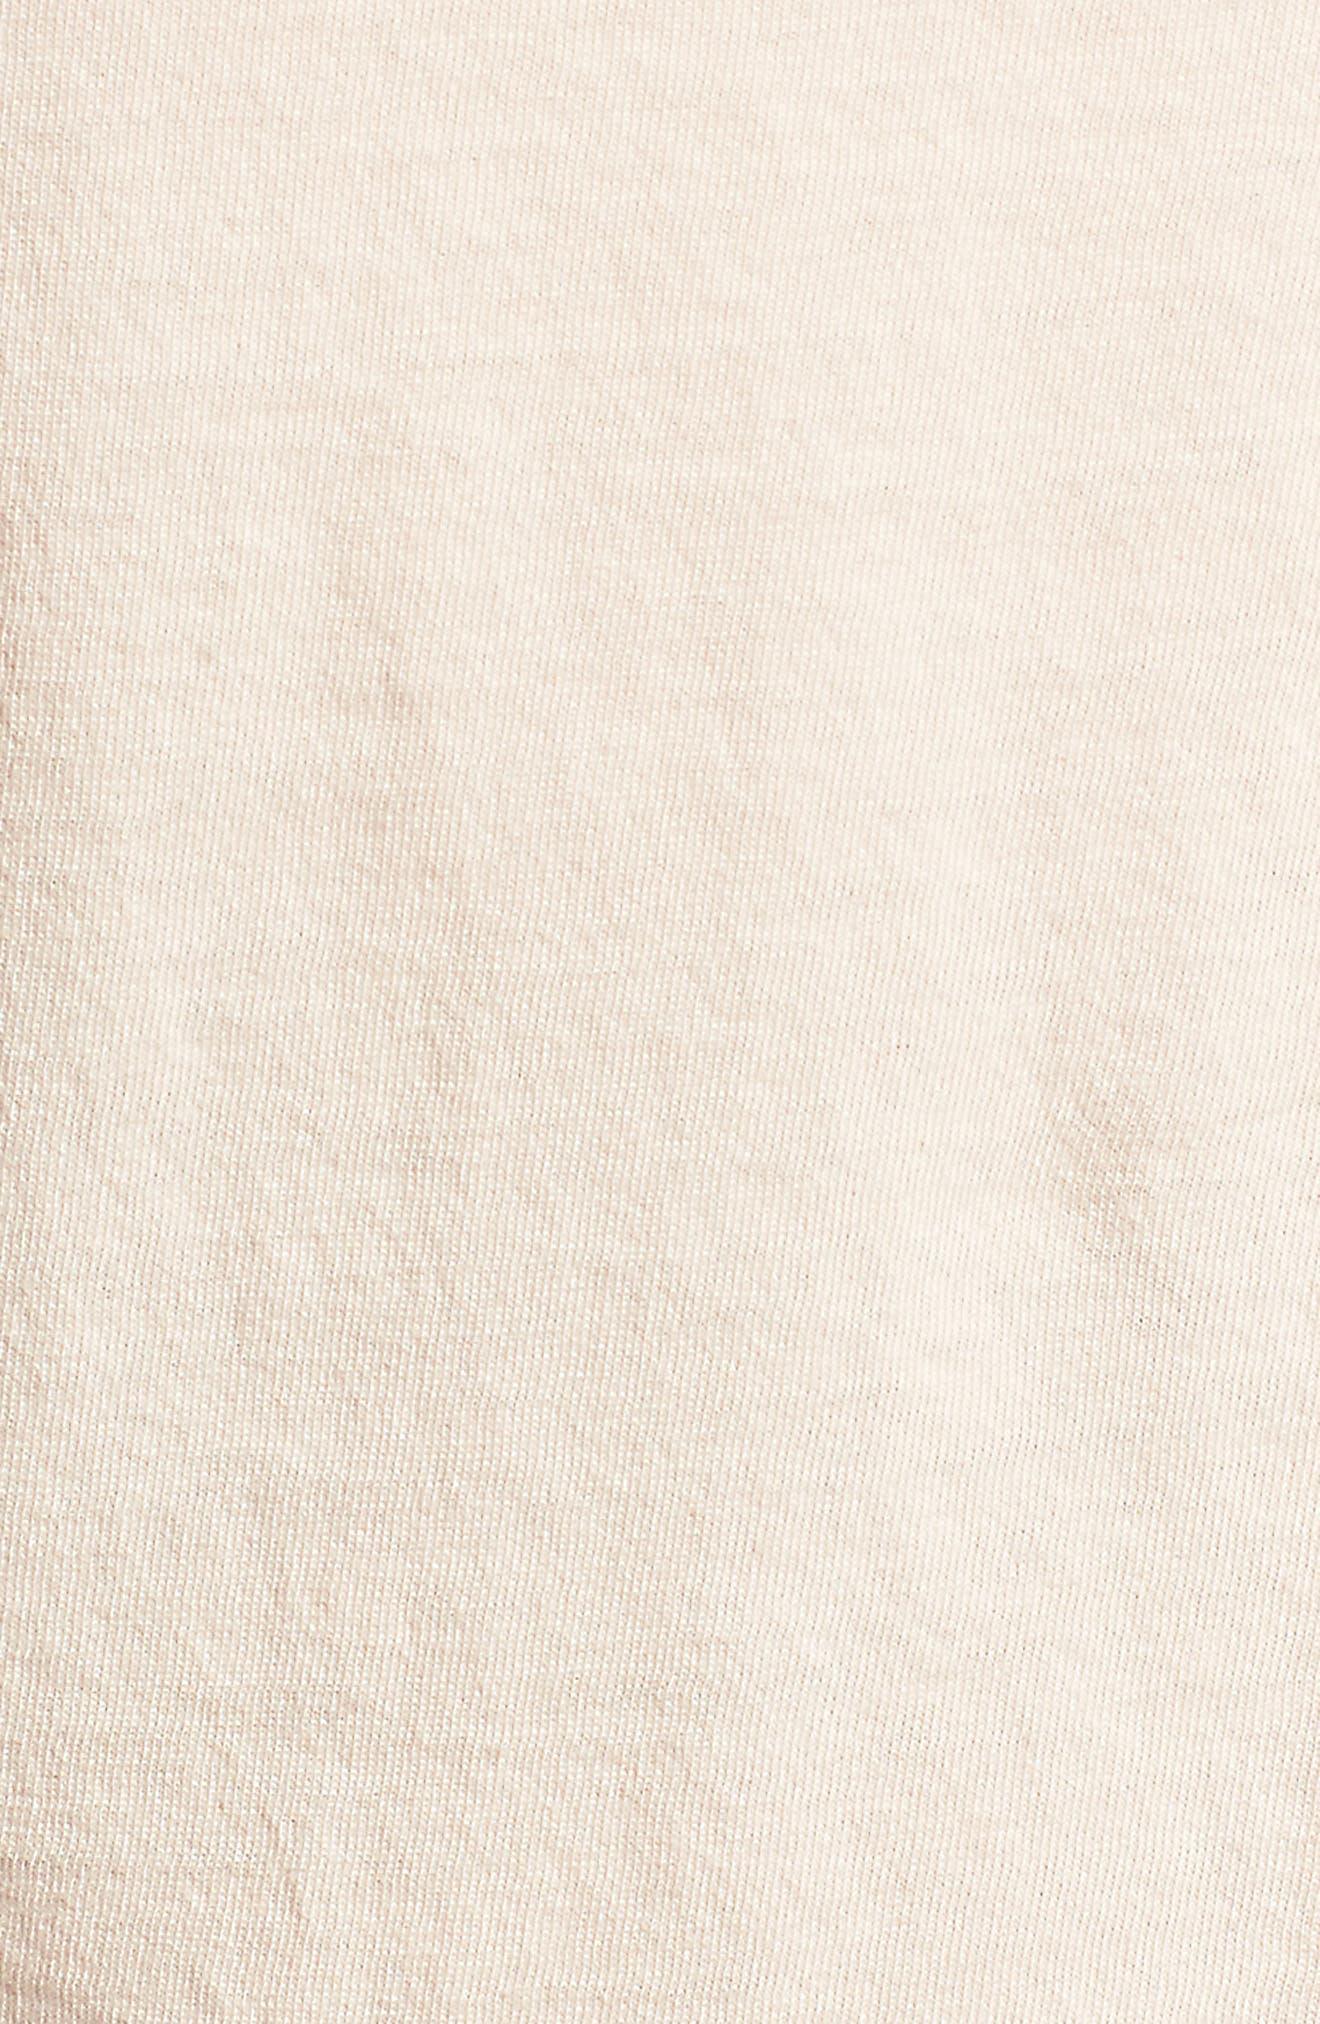 San Francisco Giants Fader Letter Tee,                             Alternate thumbnail 6, color,                             Blush